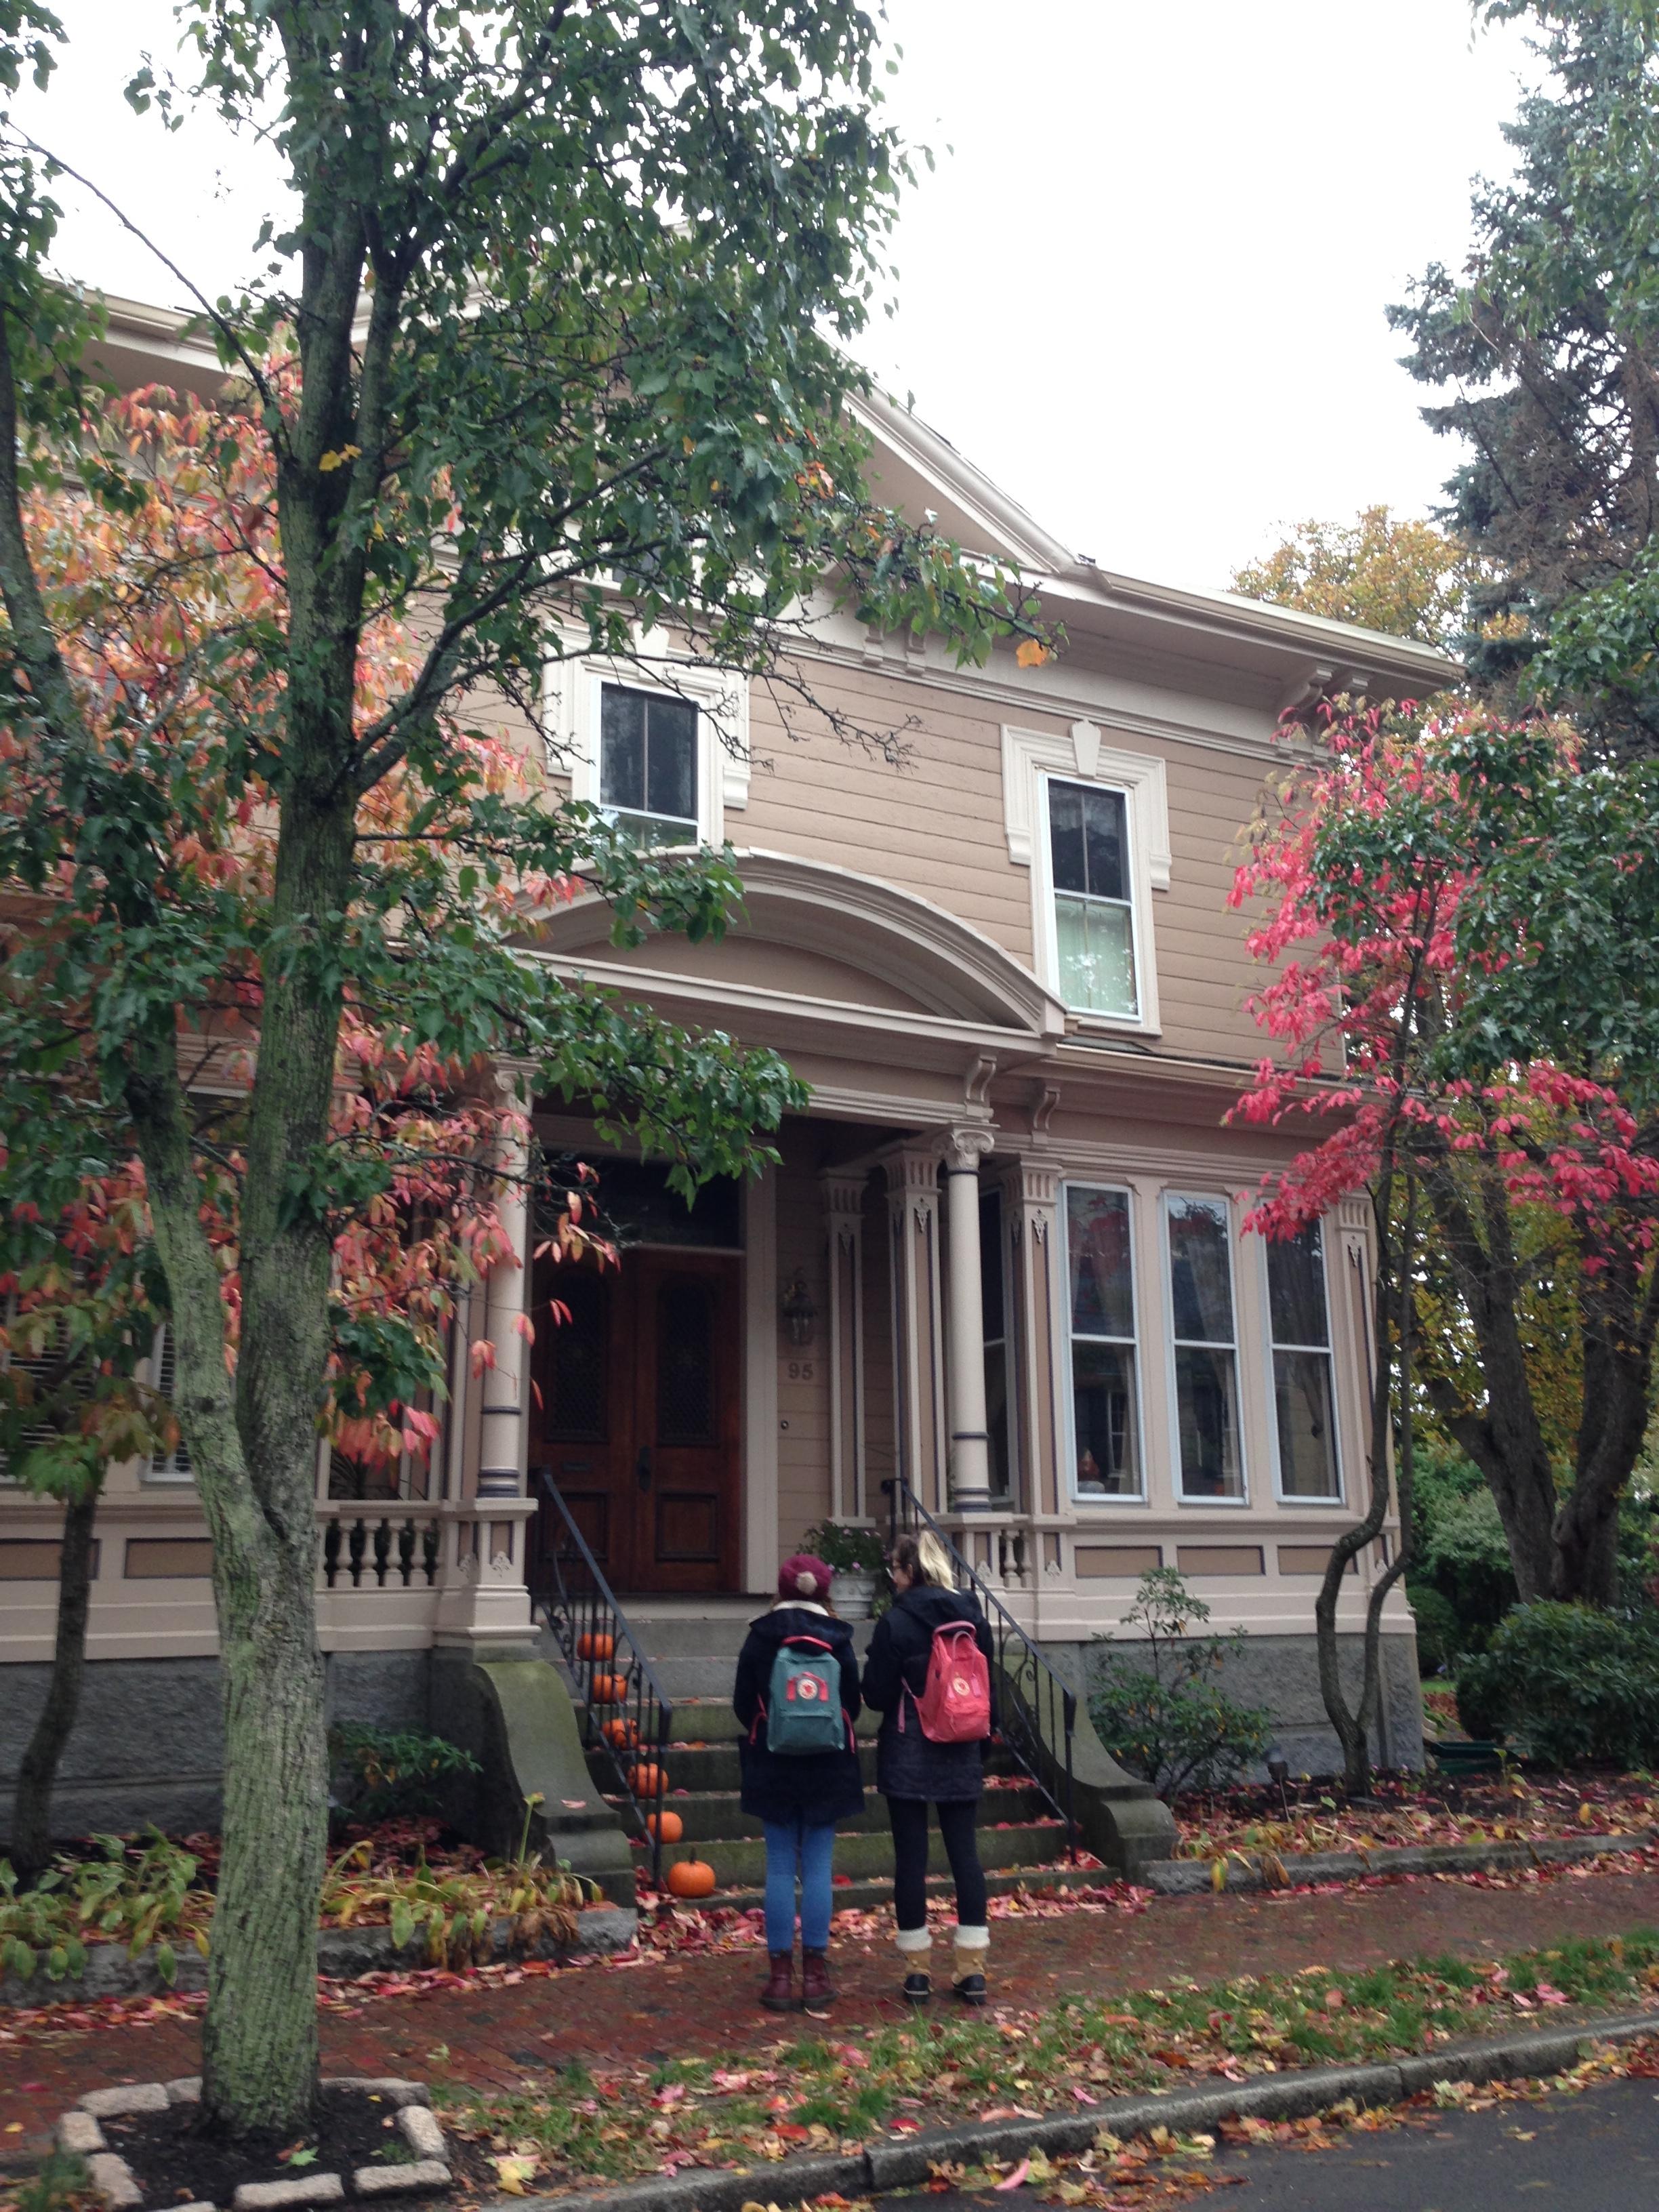 Hocus pocus and halloween in salem ma lostness for Salem house